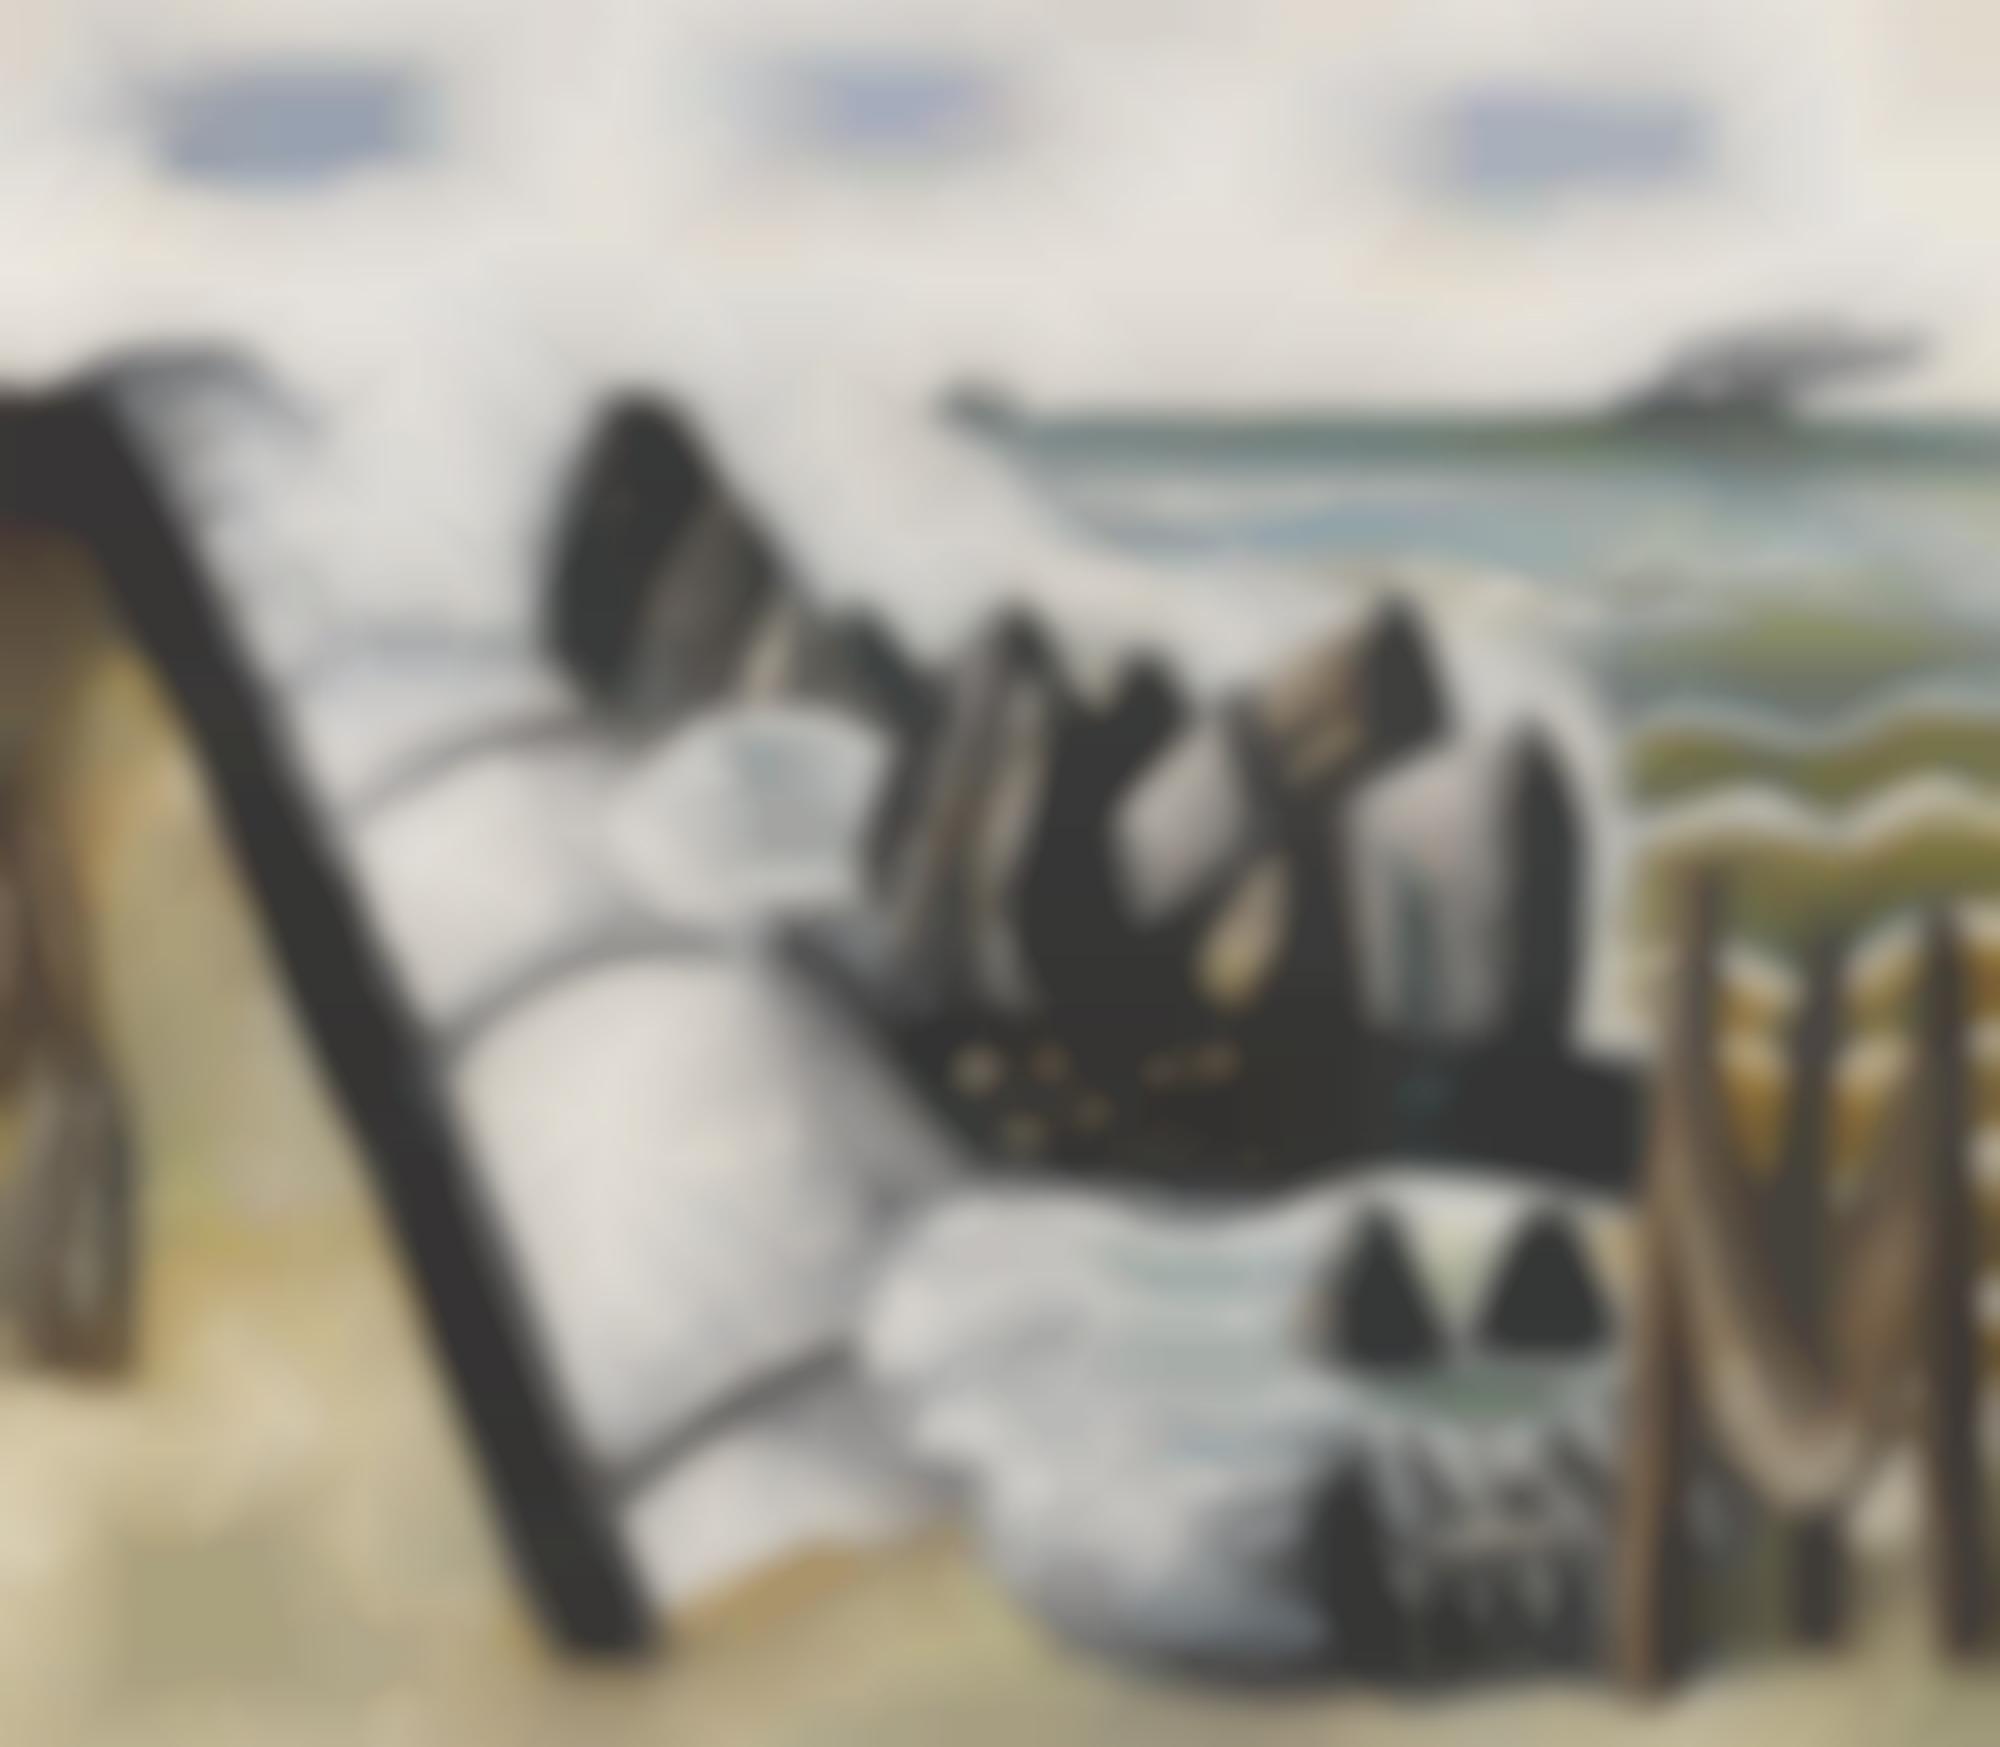 Max Beckmann-Brandung, Kleine Marine (Breakers, Small Marine)-1926